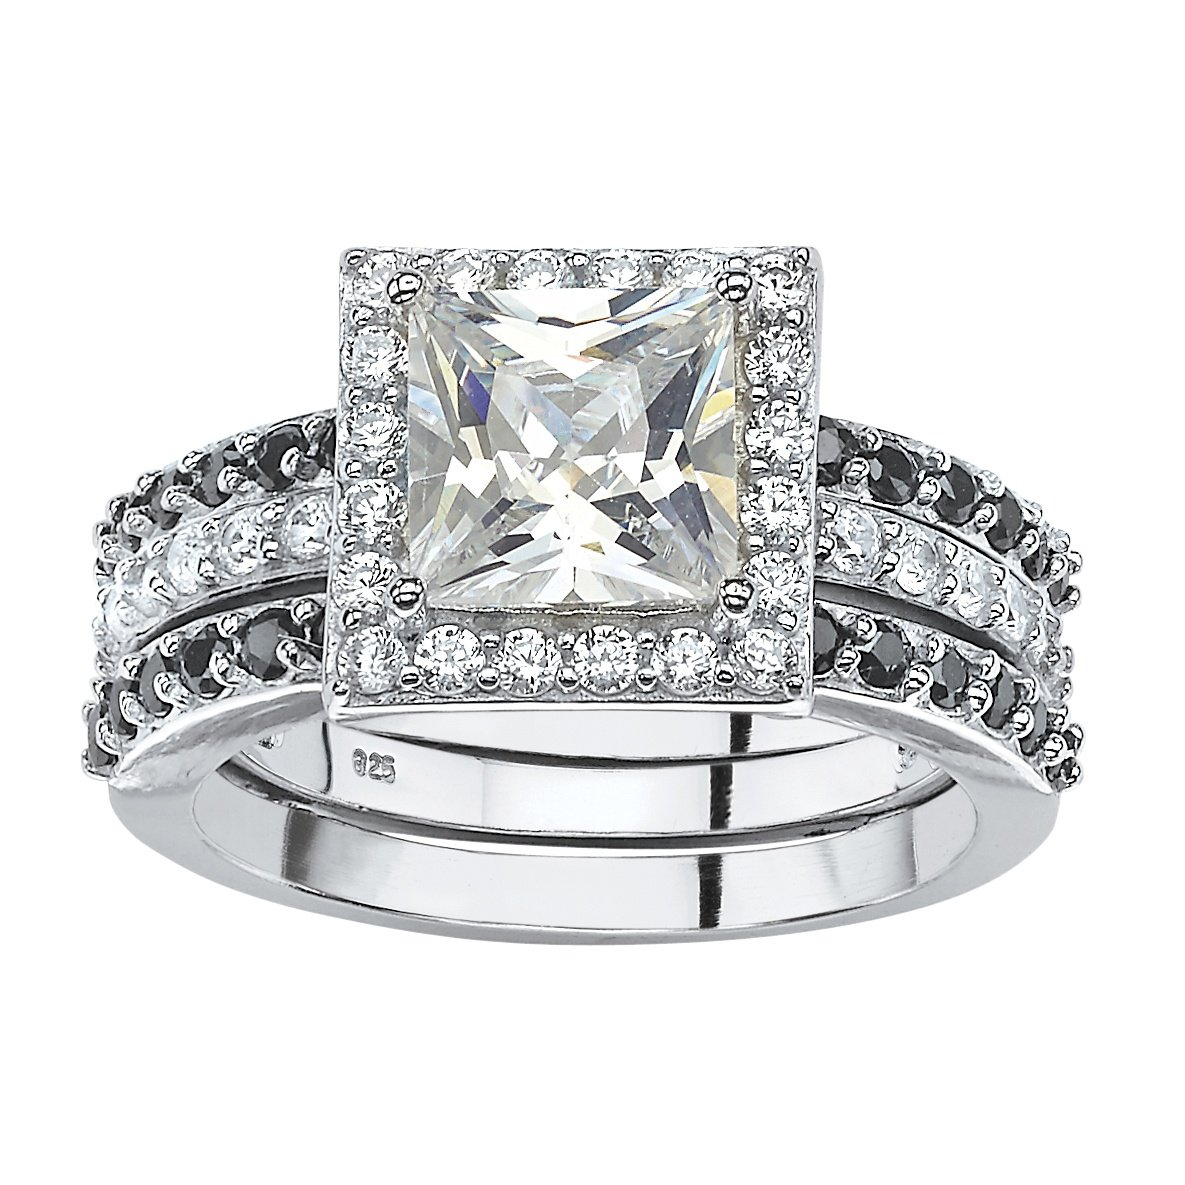 Platinum over .925 Silver Halo Jacket Wedding Ring Set Princess-Cut White and Black Cubic Zirconia Size 7